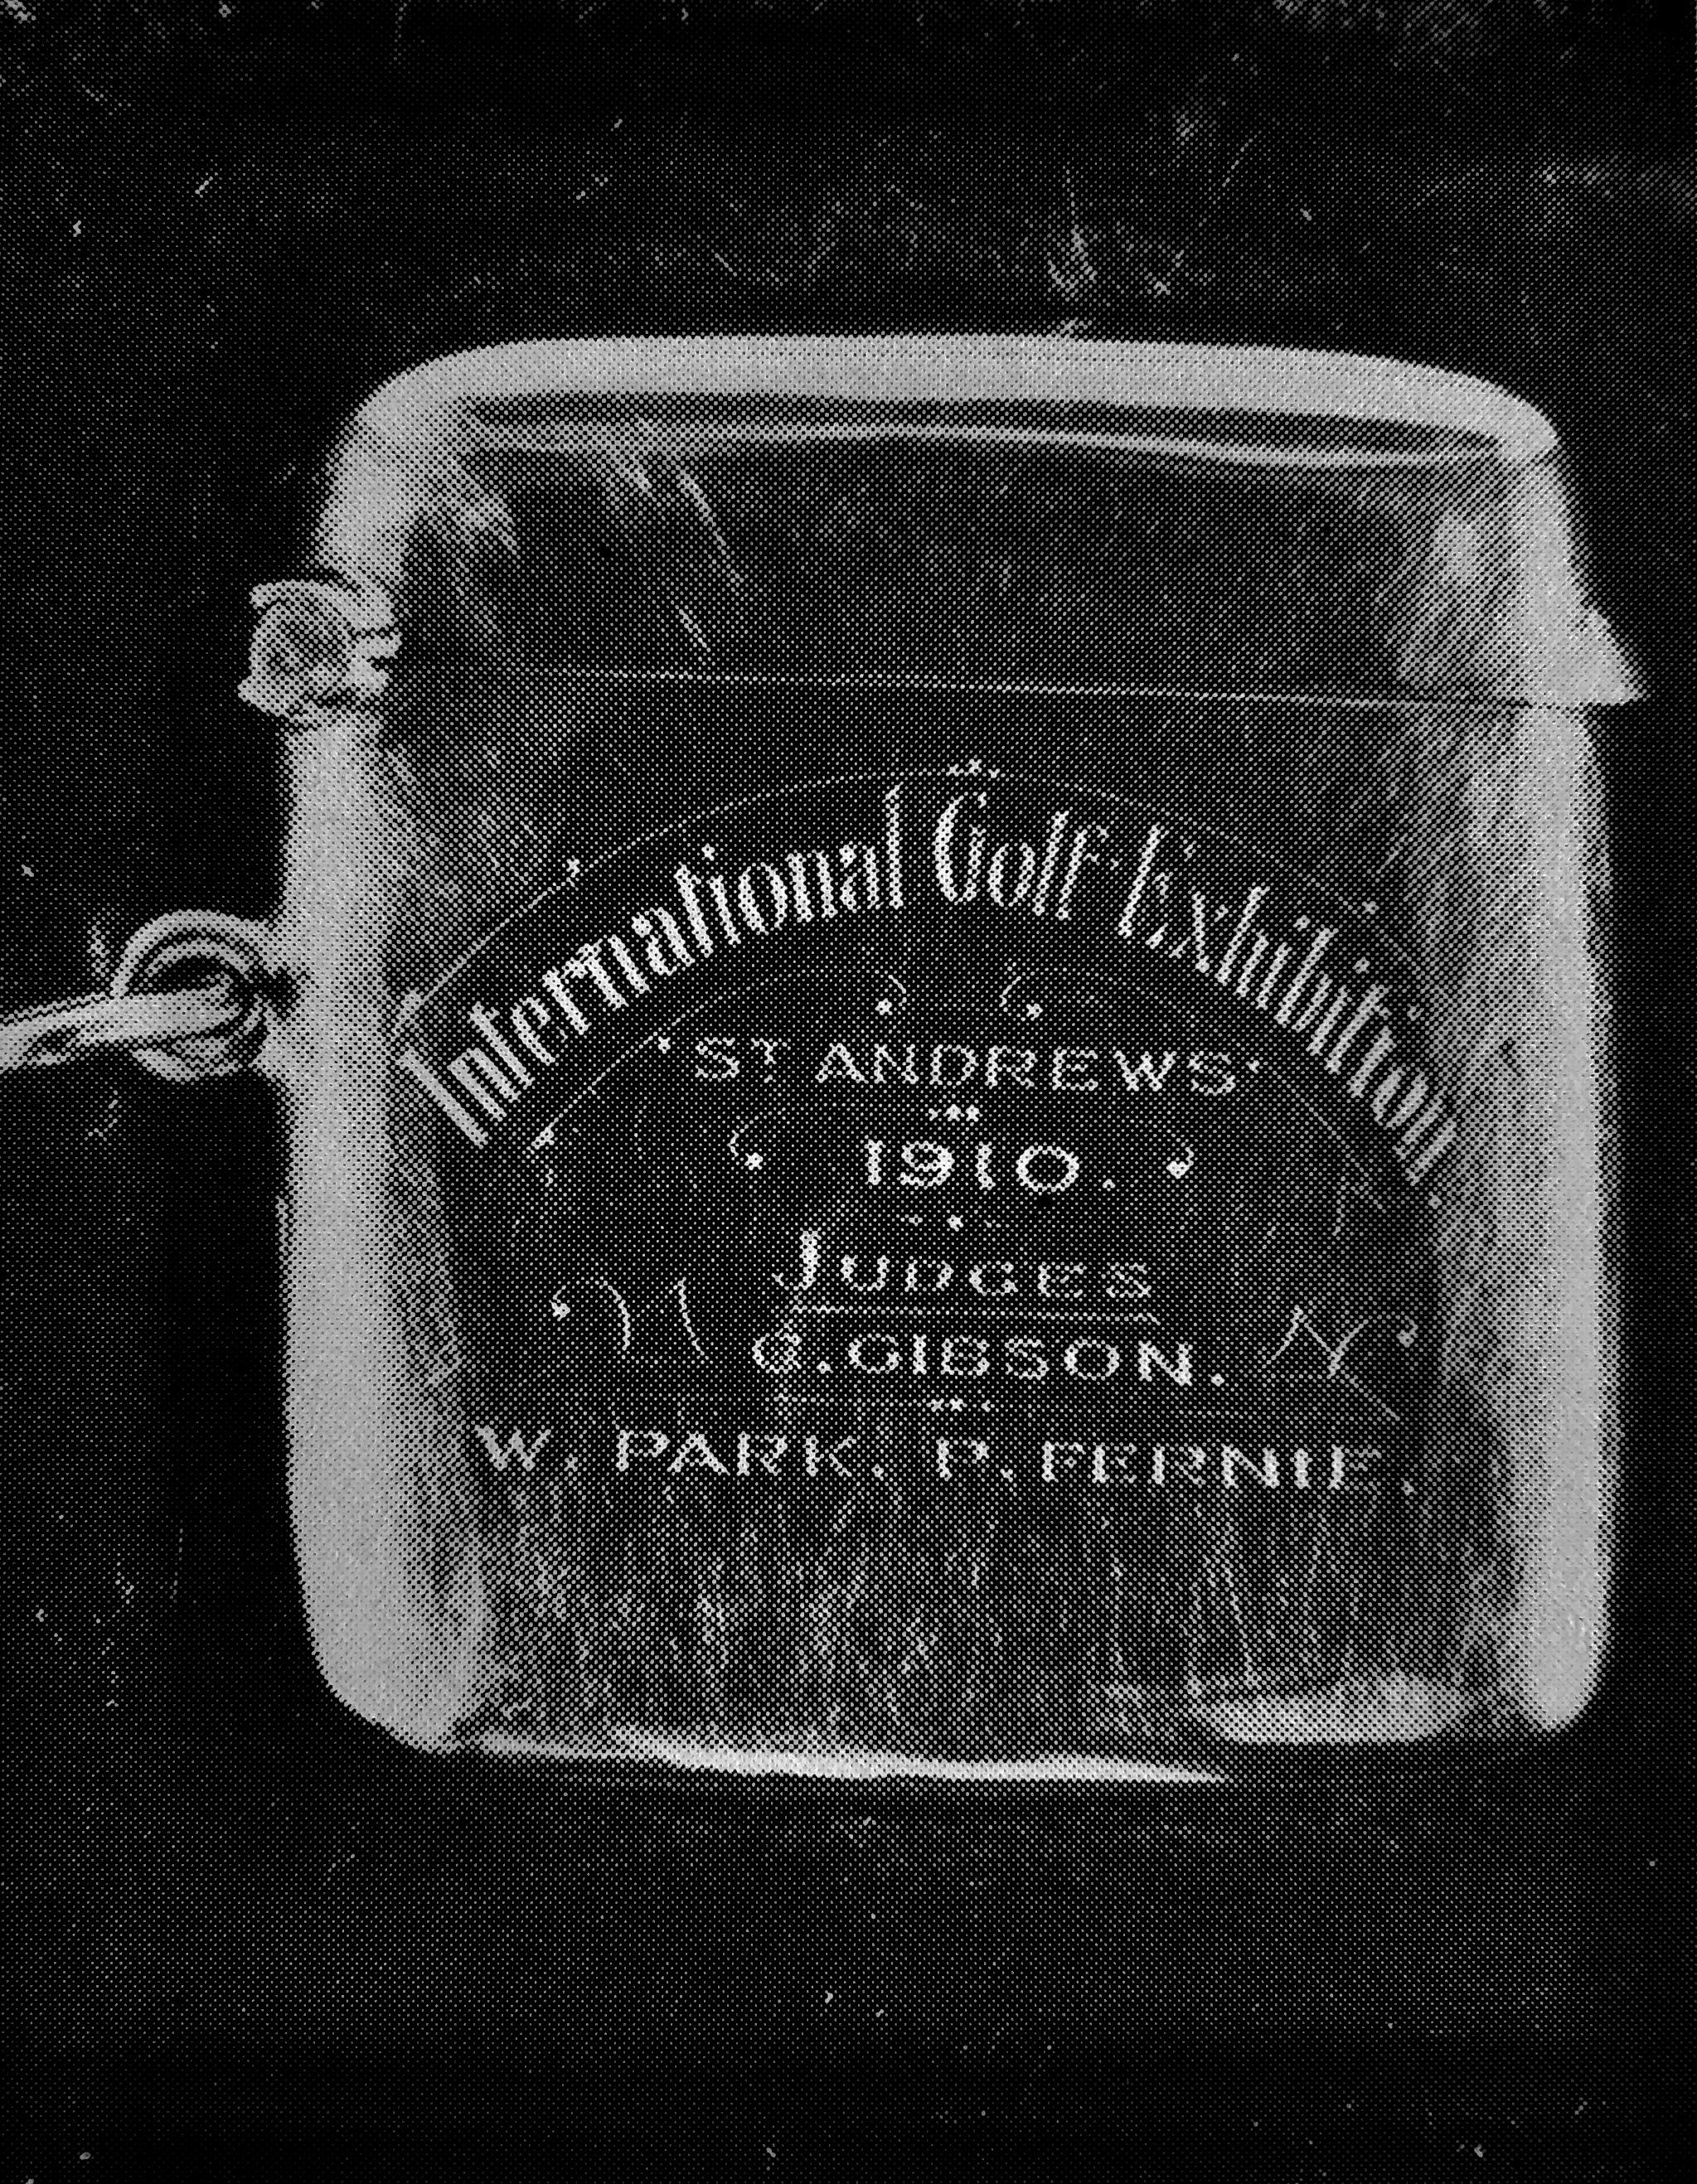 Vesta Case, presented to judges at The International Golf Exhibition, St. Andrews, 1910